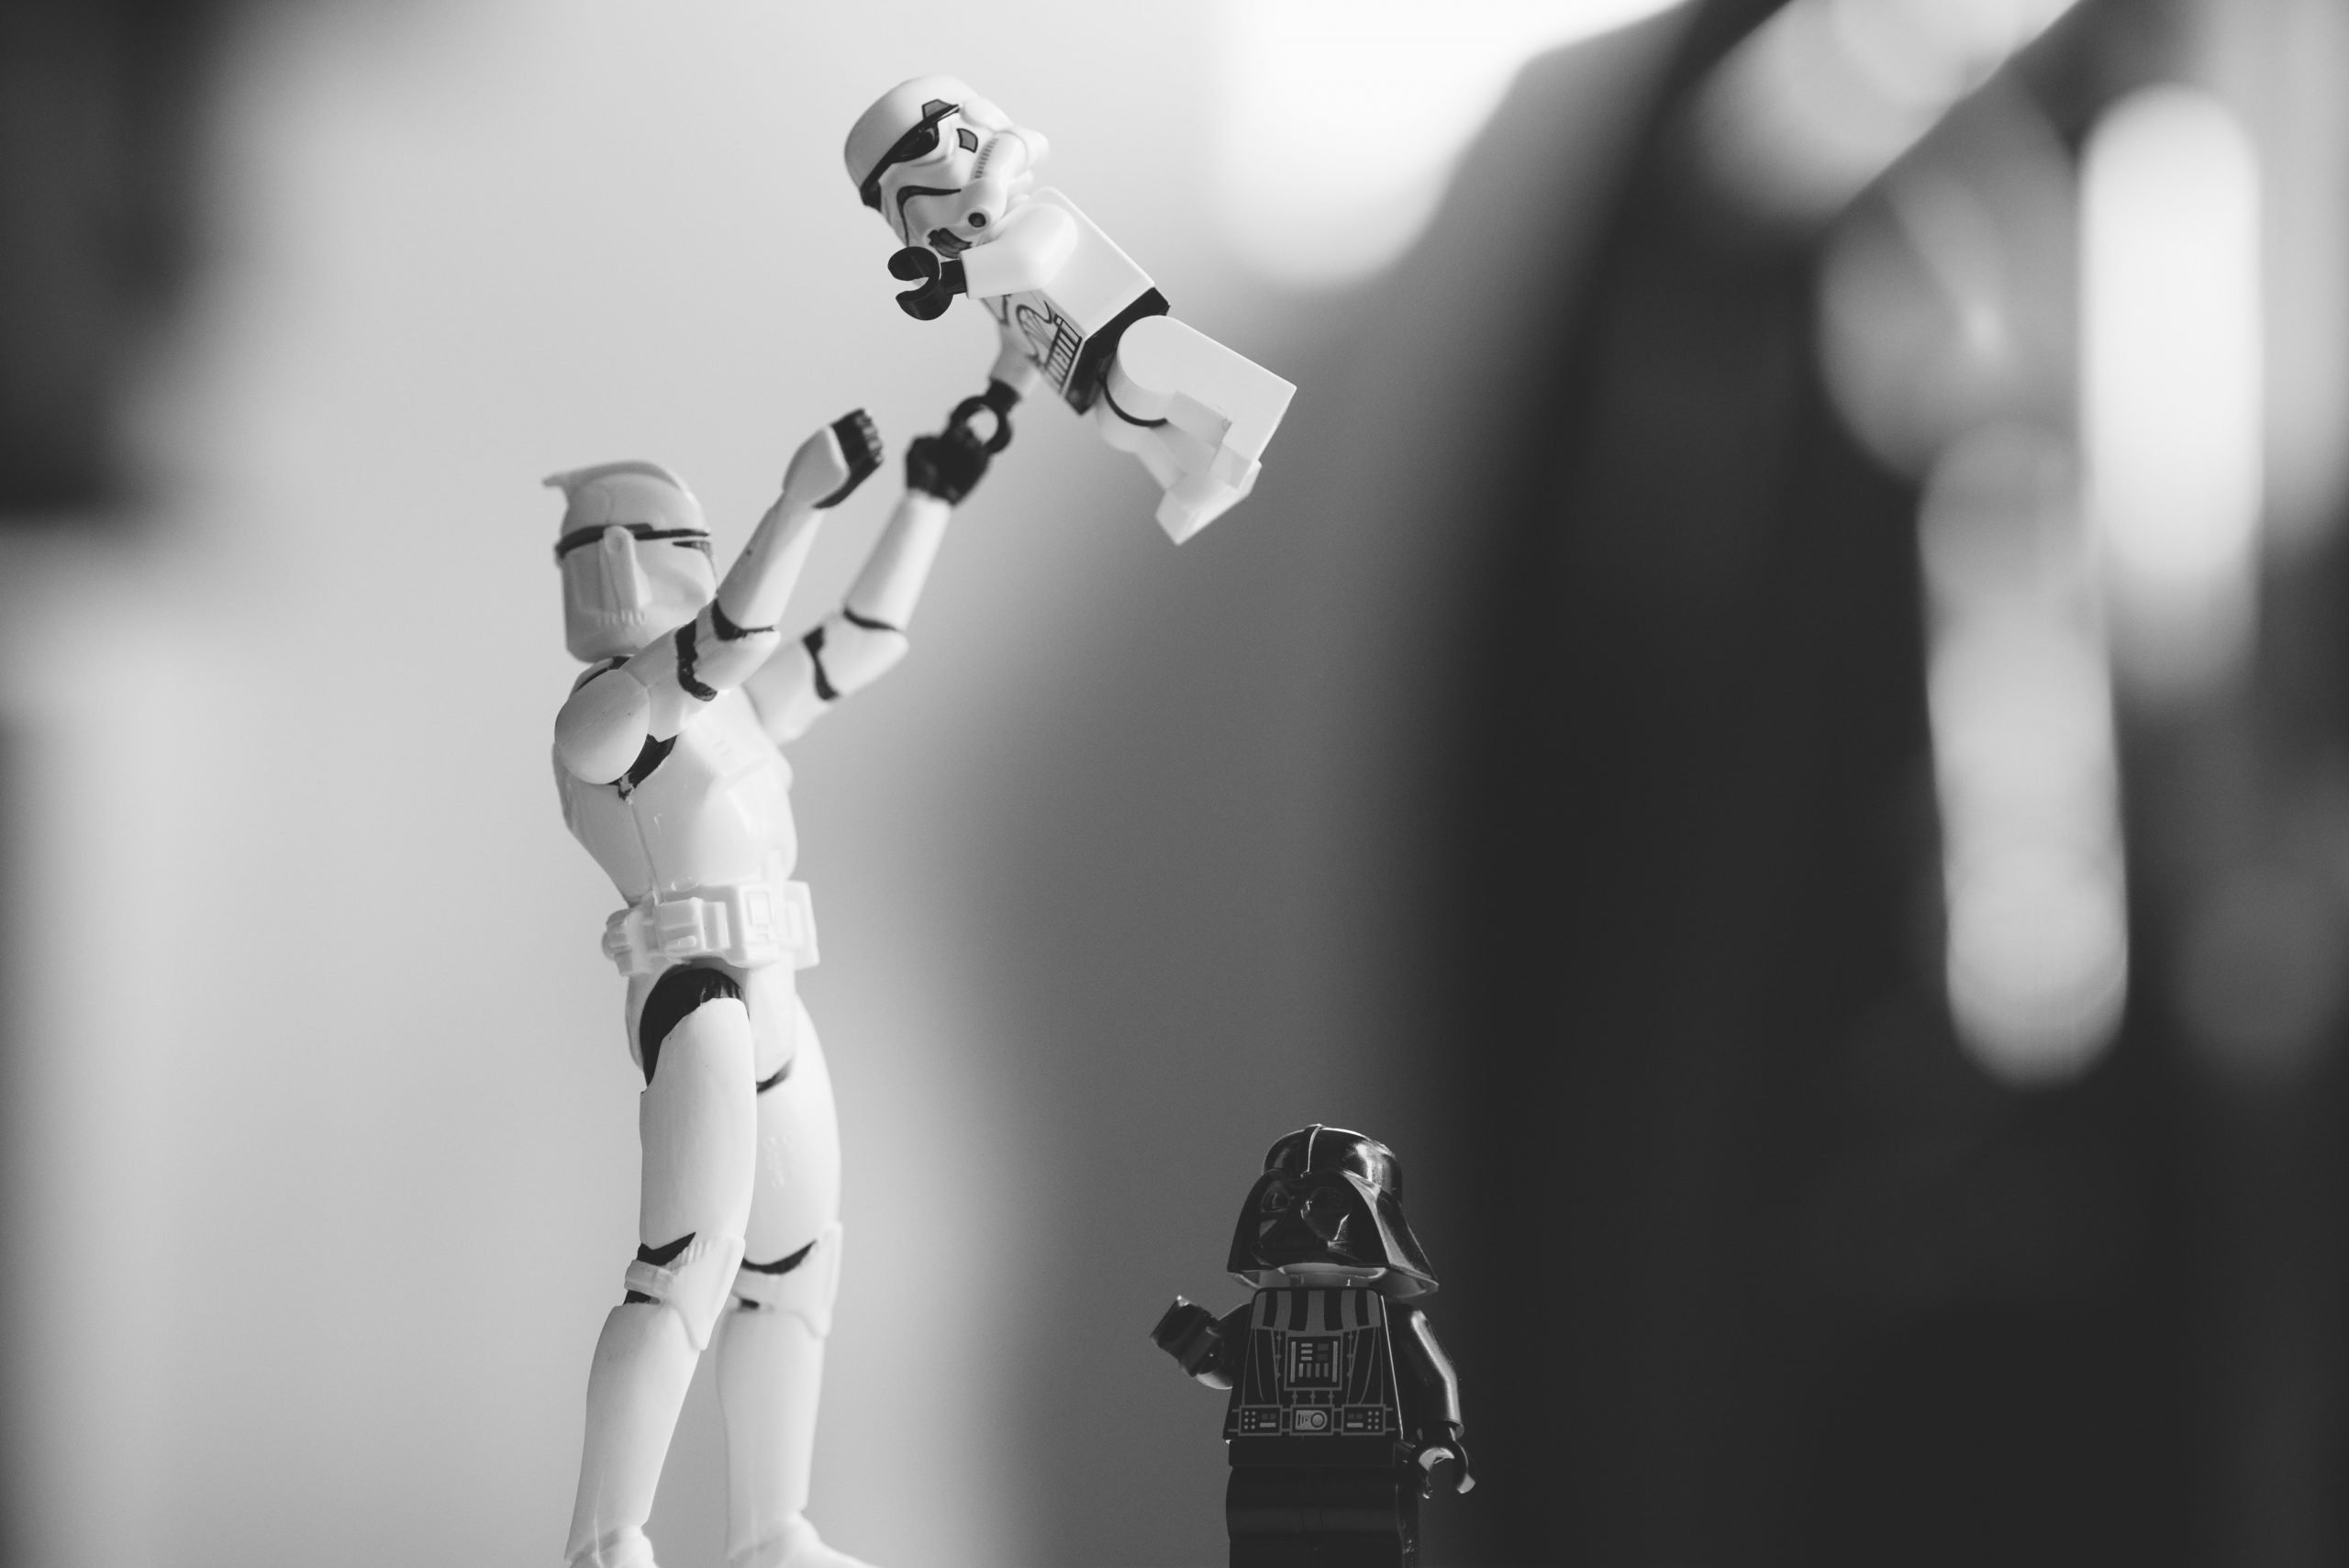 Un clone jette en l'air un enfant clone avec un tout petit Darth Vador à ses pieds (en Lego)